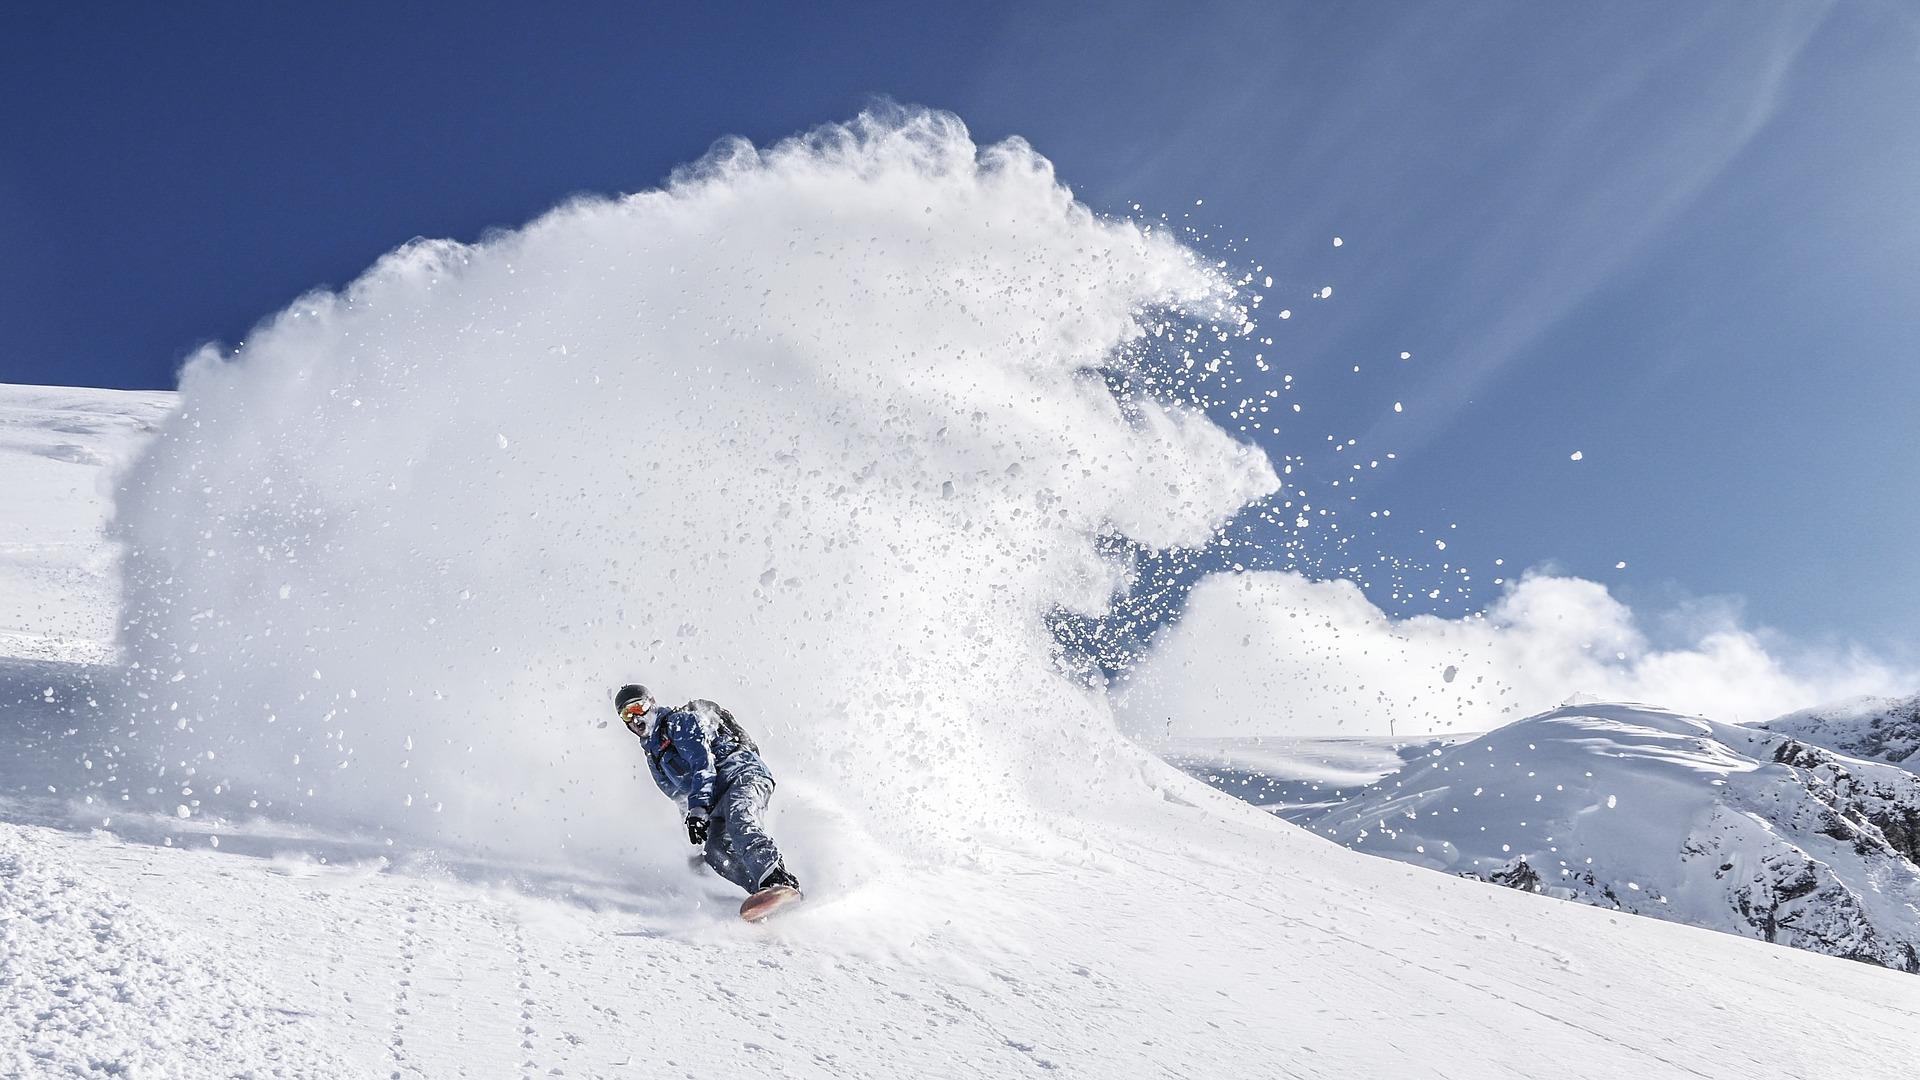 snowboarding-2598176_1920